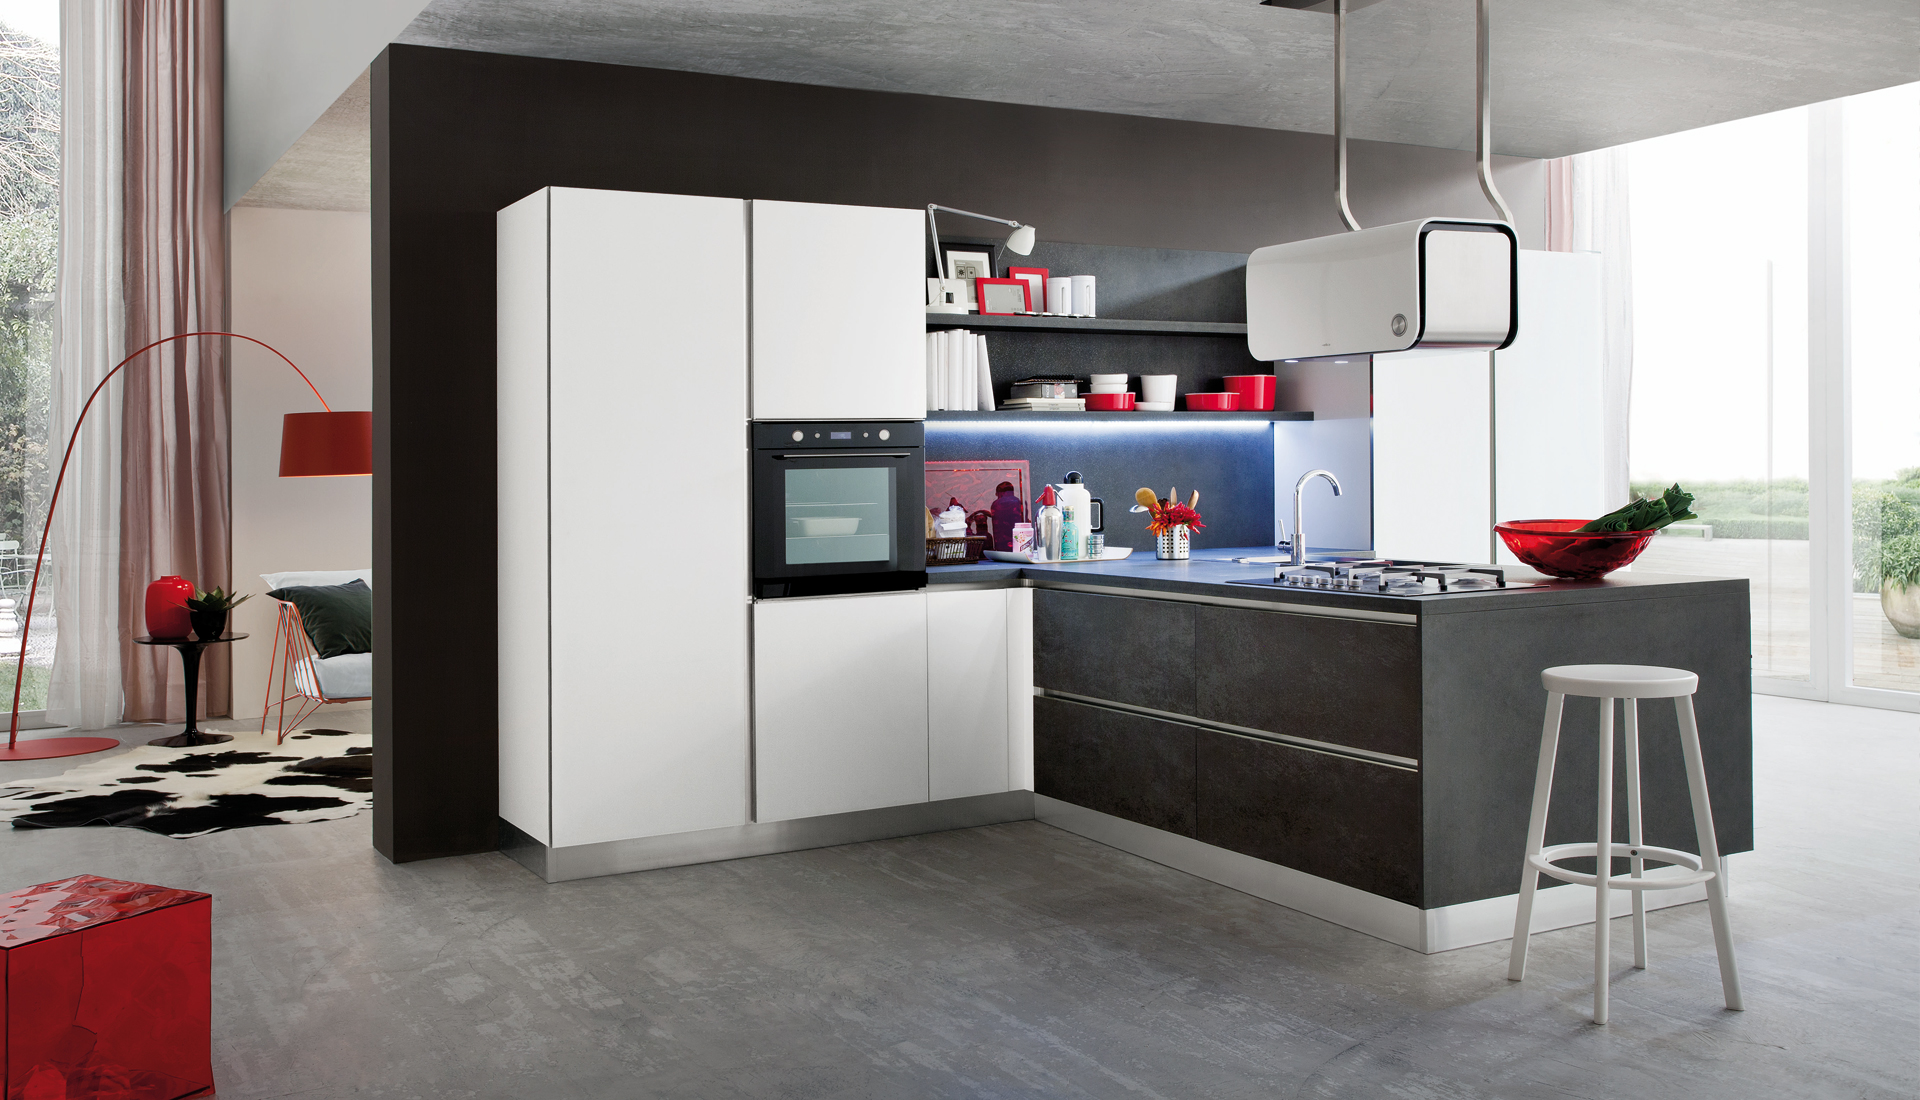 Cucina moderna MyGlass by Gicinque